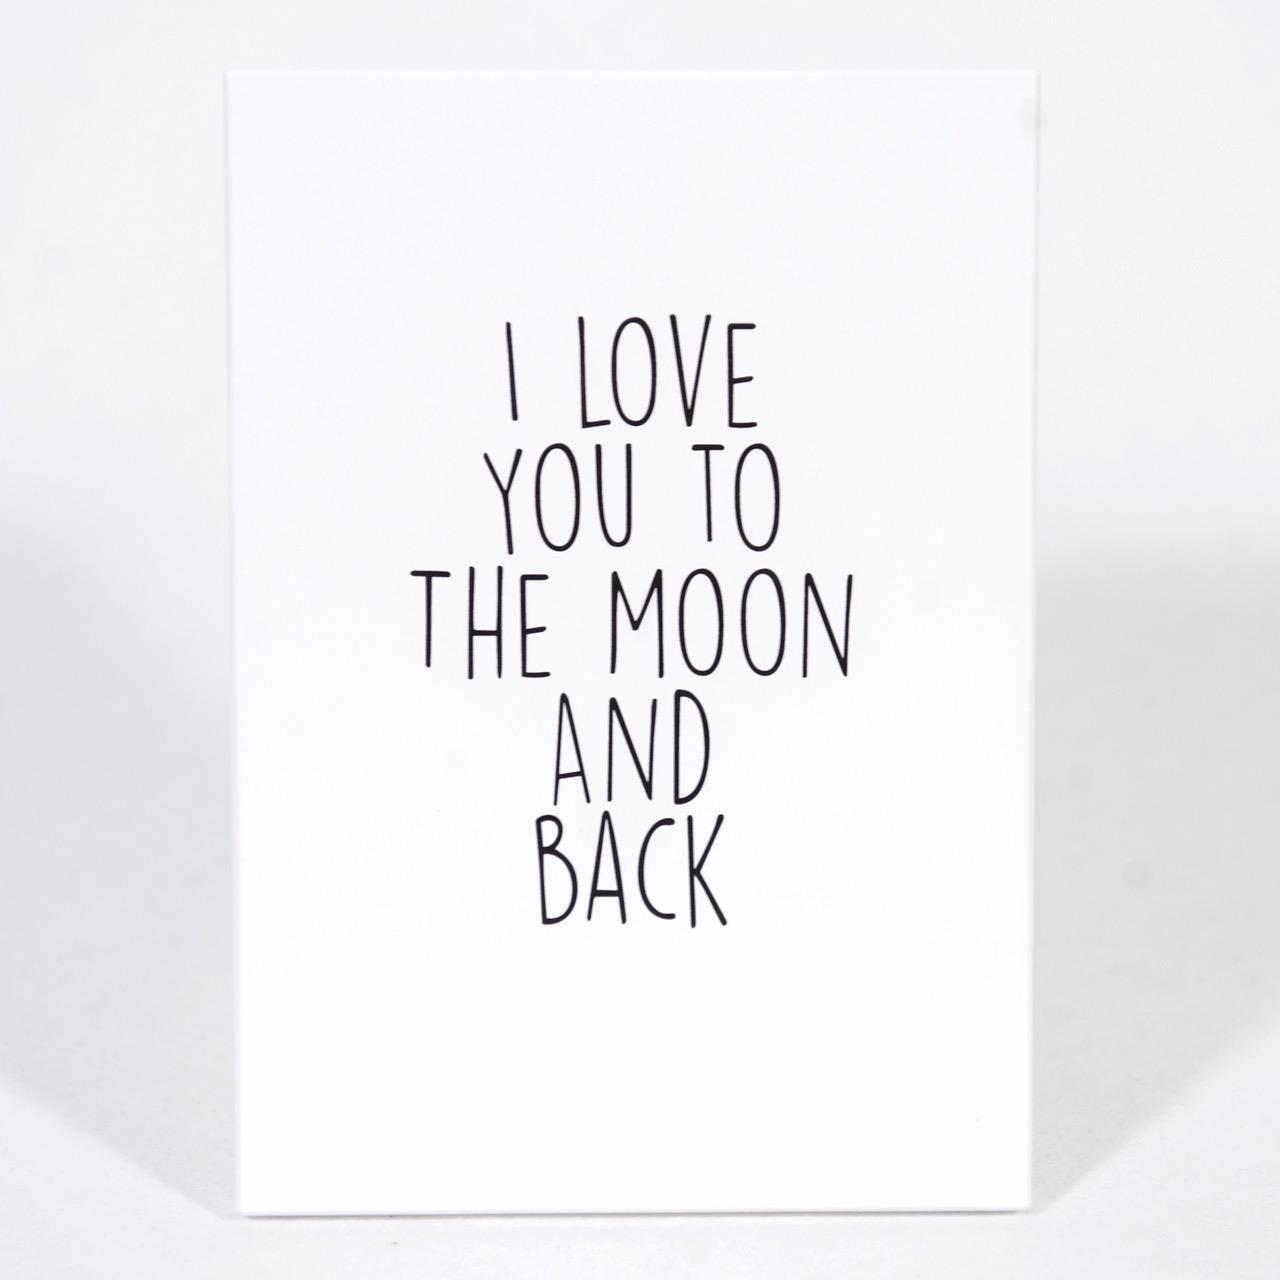 Trätavla A5, I love you to the moon,vit/svart text